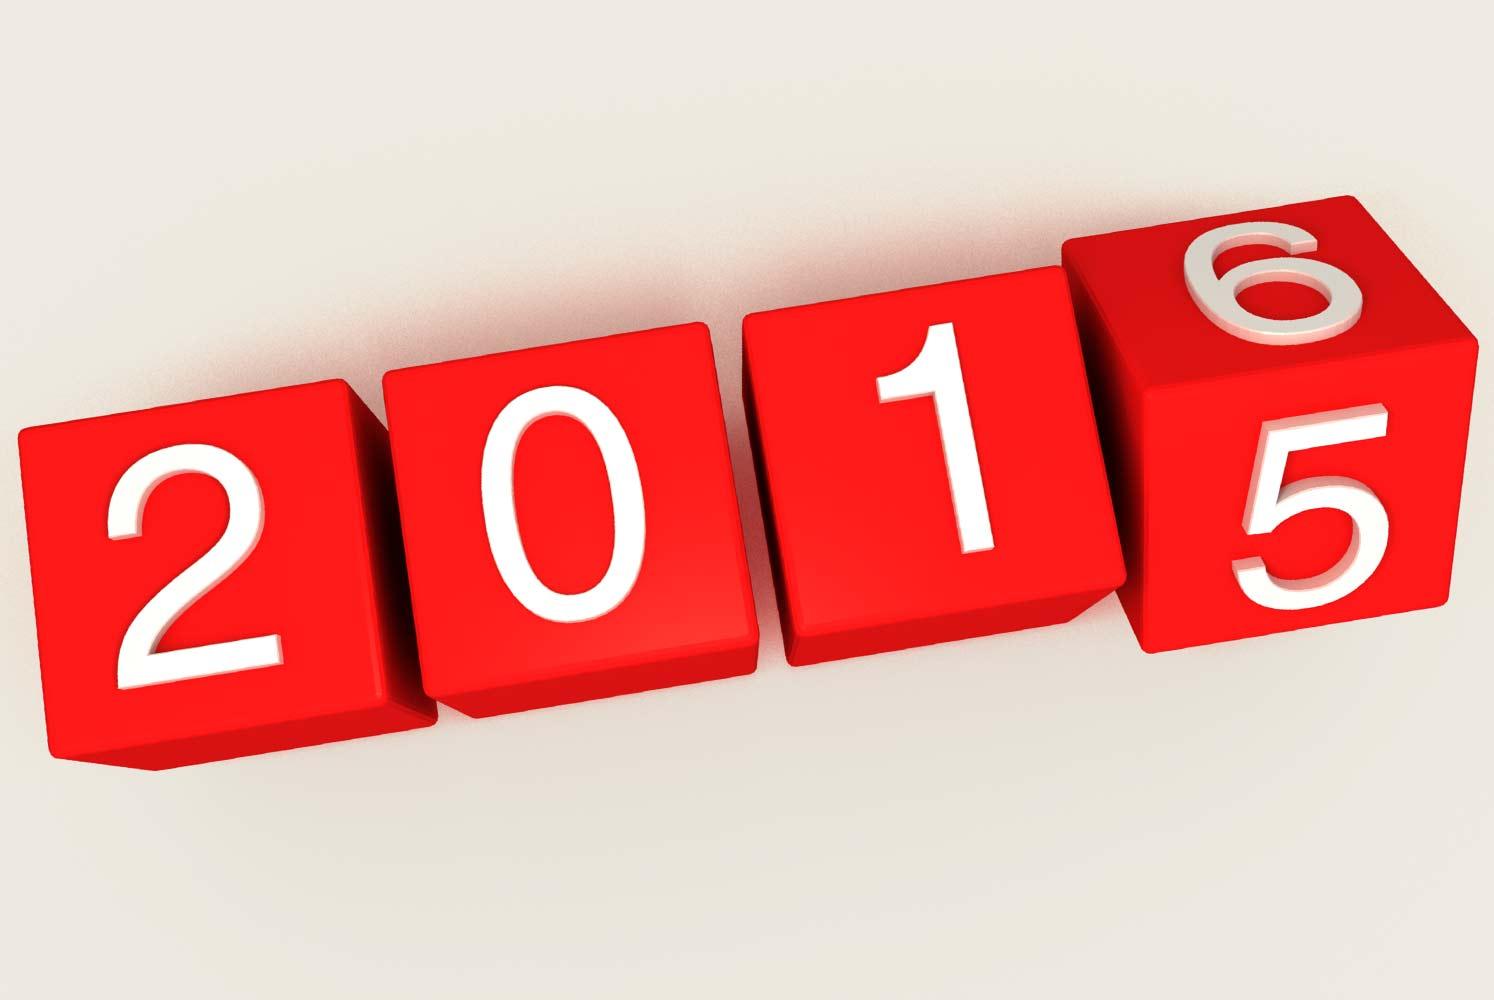 2015-2016